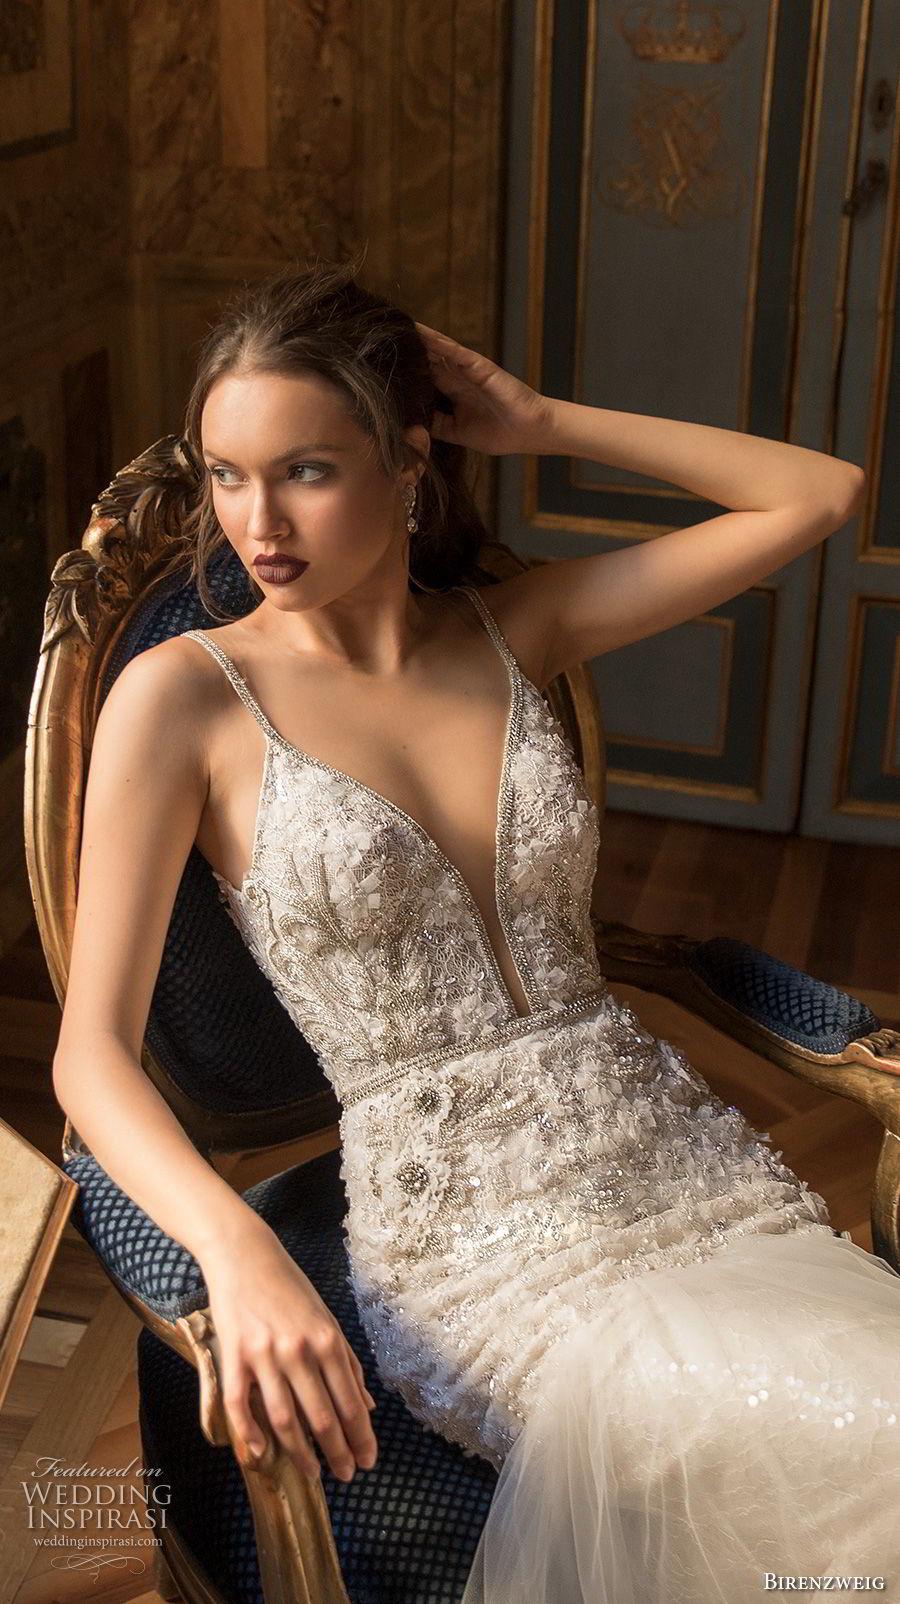 birenzweig 2018 bridal spaghetti strap deep plunging sweetheart neckline heavily embellished bodice sexy elegant trumpet wedding dress open v back chapel train (15) zv